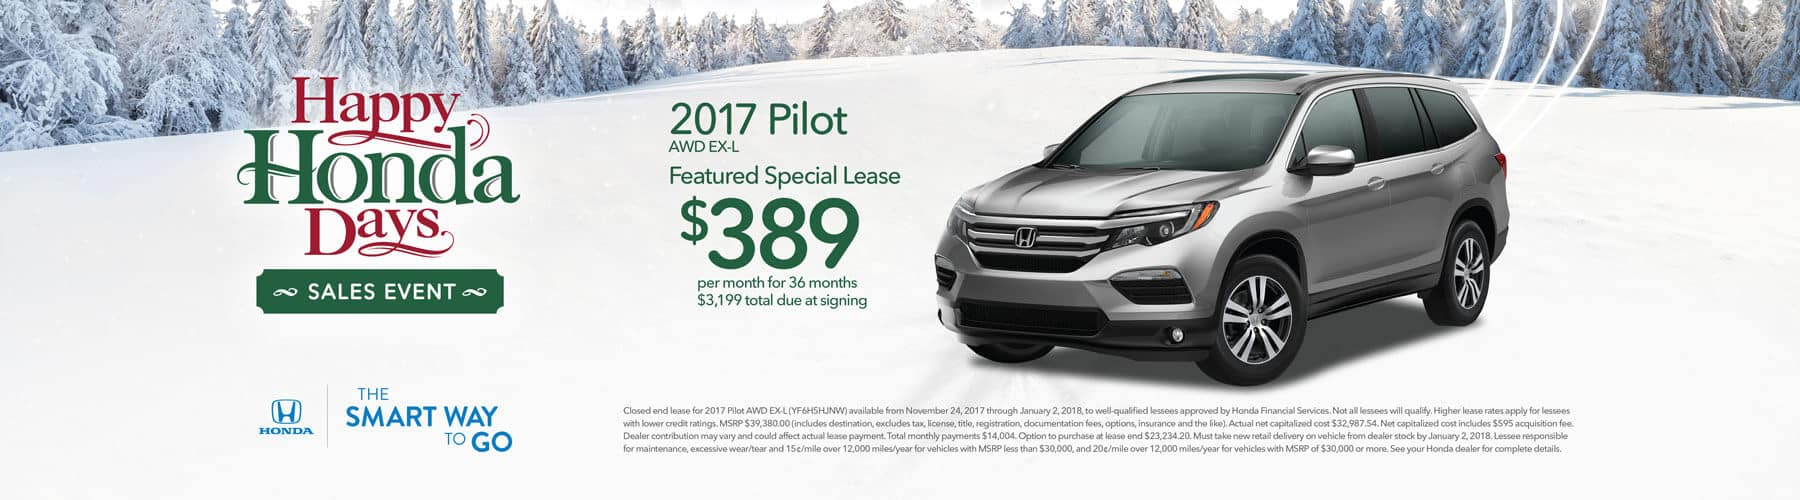 Happy Honda Days 2017 Pilot Lease Offer